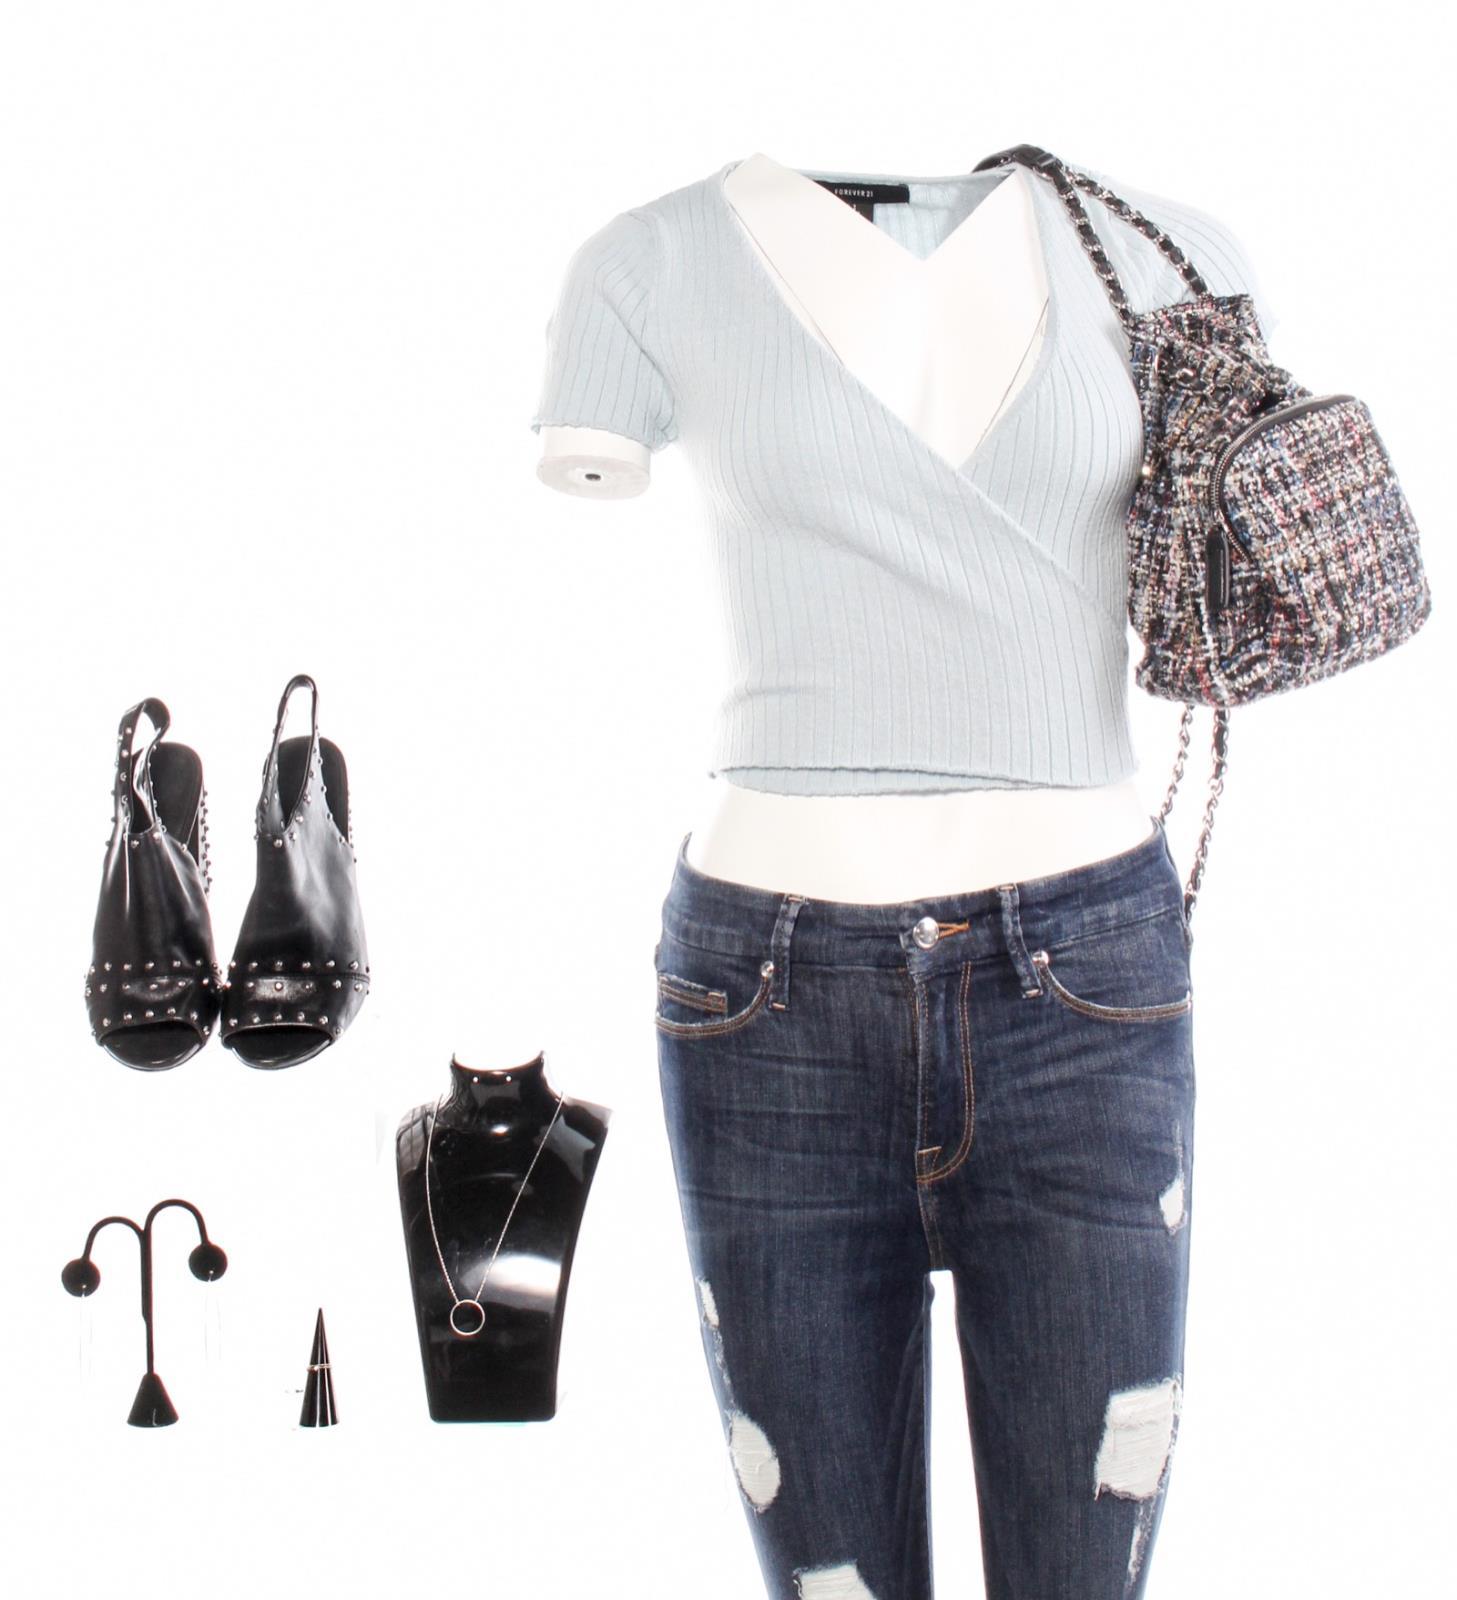 0c599b4eb988 Details about LA To Vegas Nichole Olivia Macklin Screen Worn Shirt Pants  Purse   Shoes Ep 113